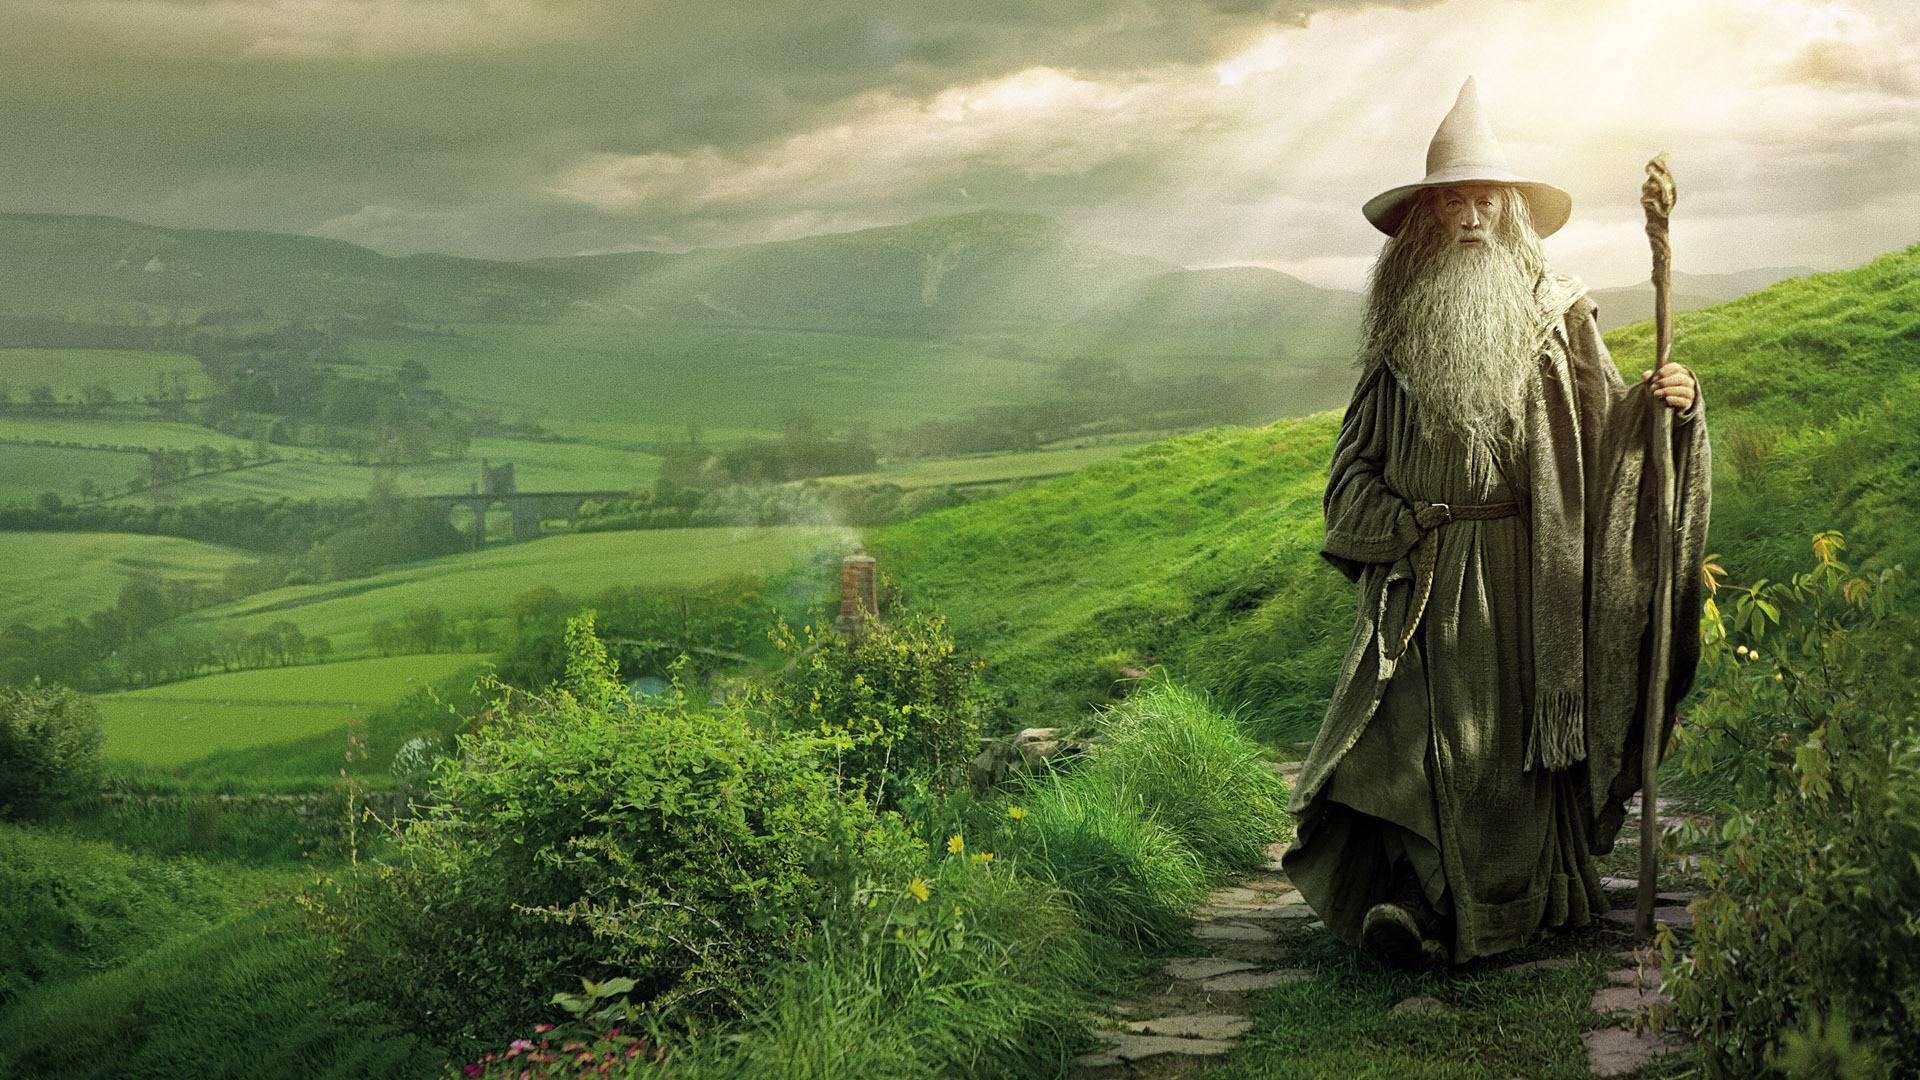 The Hobbit An Unexpected Journey wallpaper 10 1920x1080